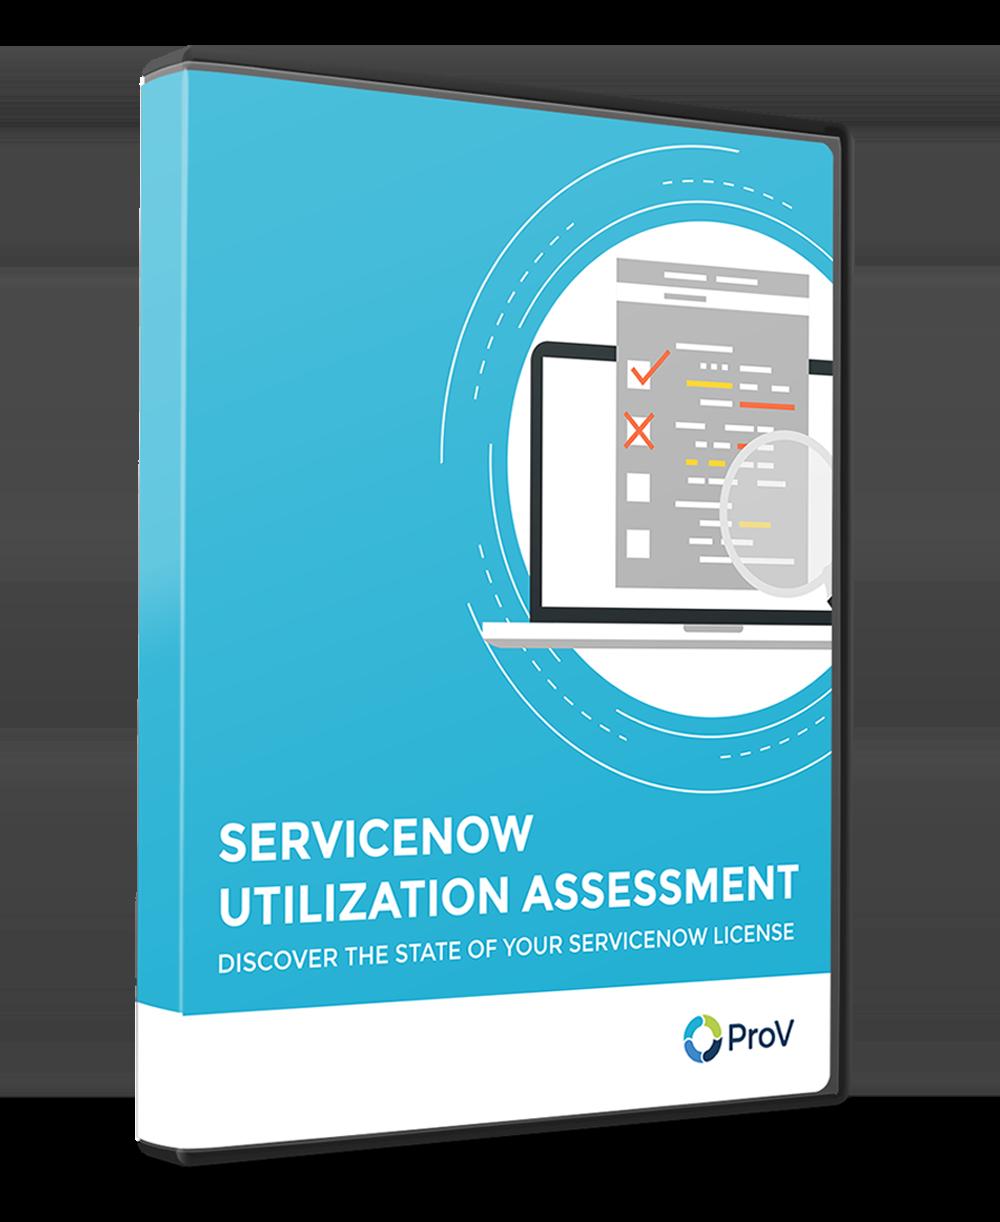 servicenow-utilization-assessment